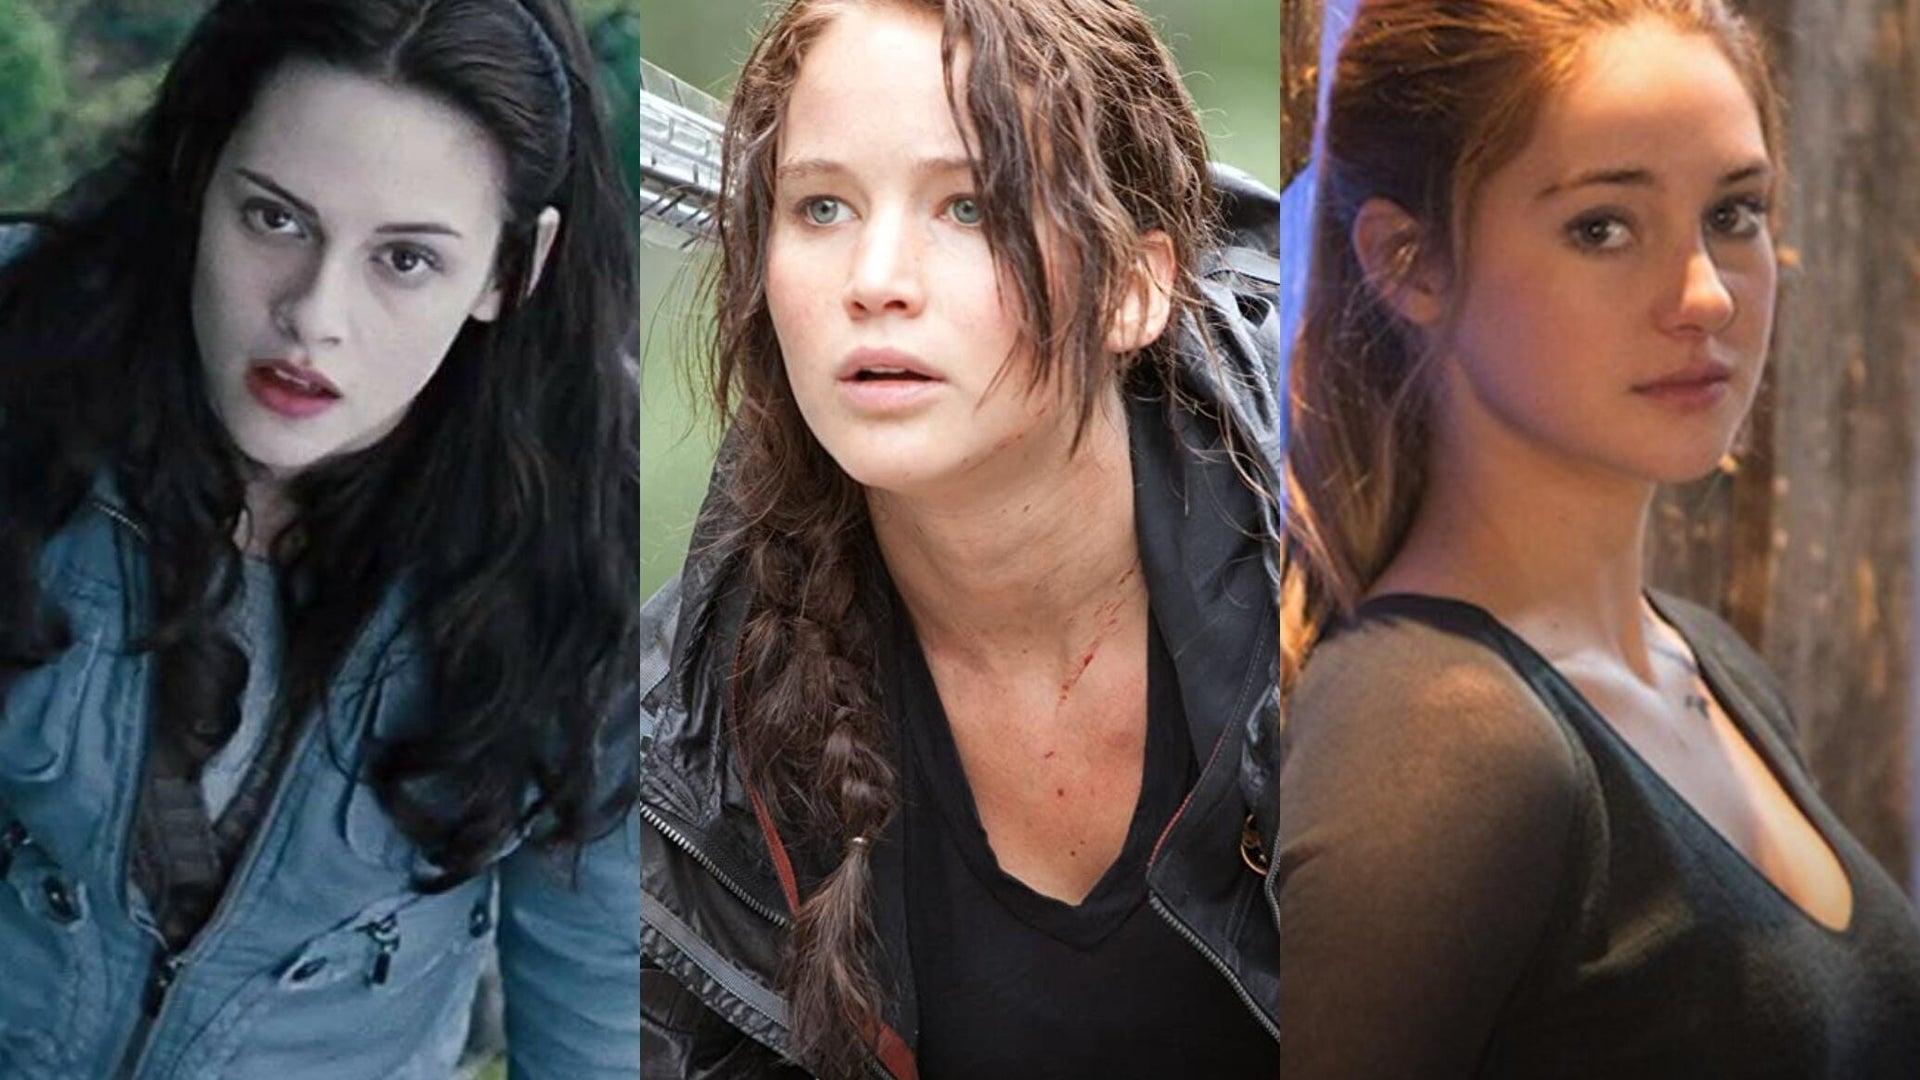 Kristen Stewart, Twilight; Jennifer Lawrence, The Hunger Games; Shailene Woodley, Divergent